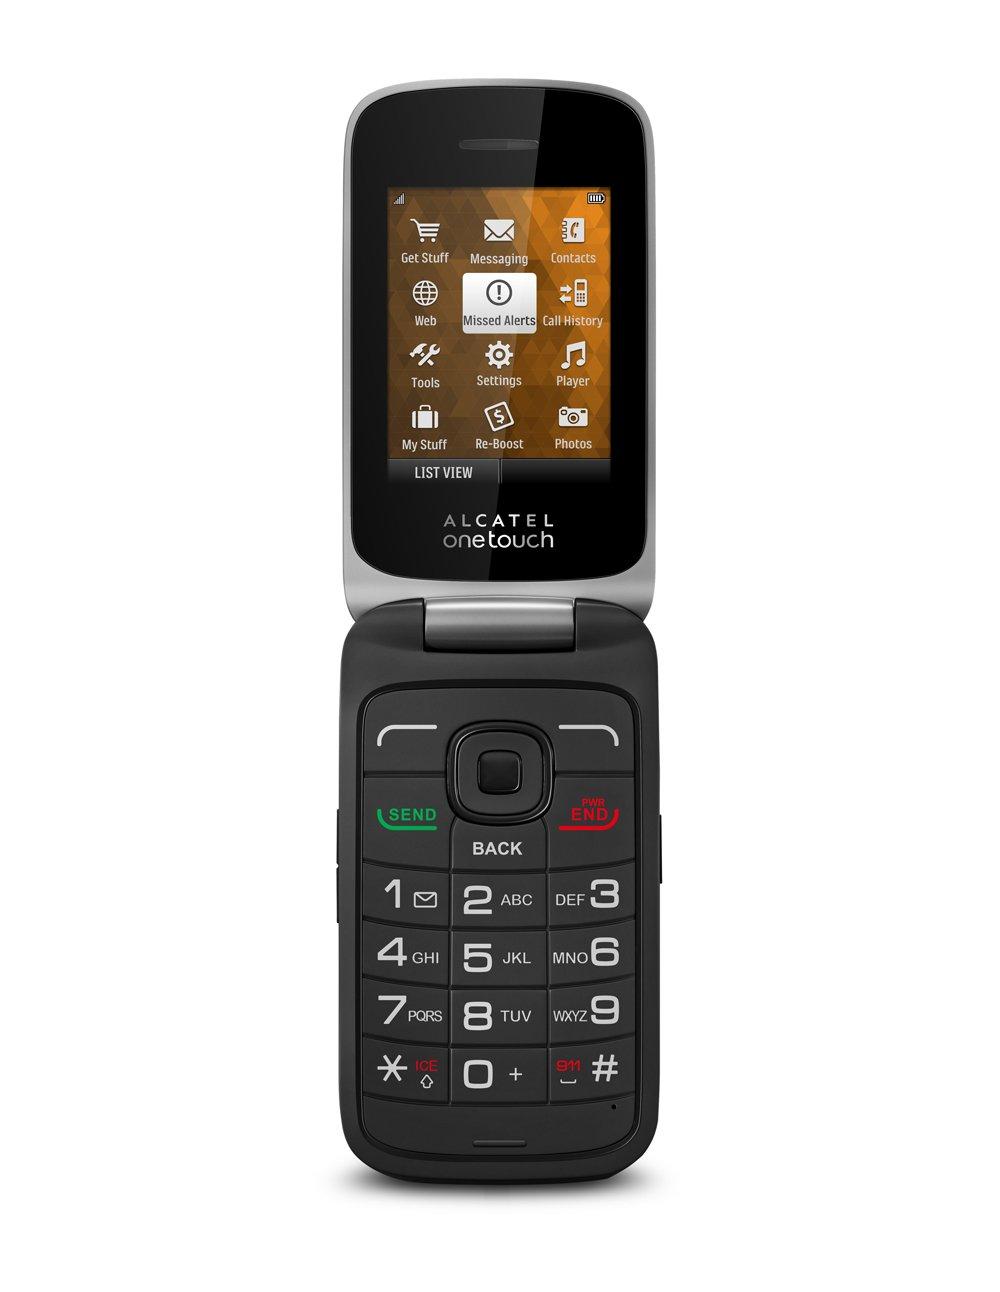 image of Alcatel smartphone